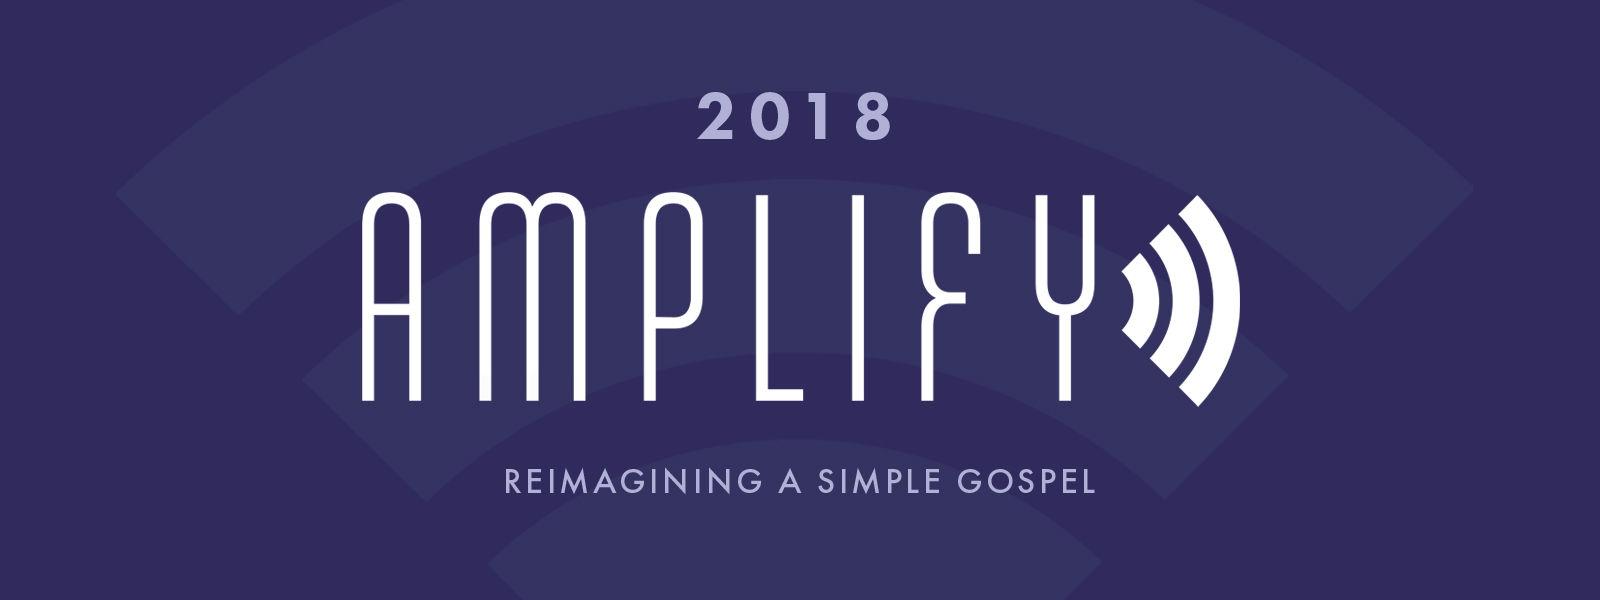 Amplify 2018: Reimagining a Simple Gospel